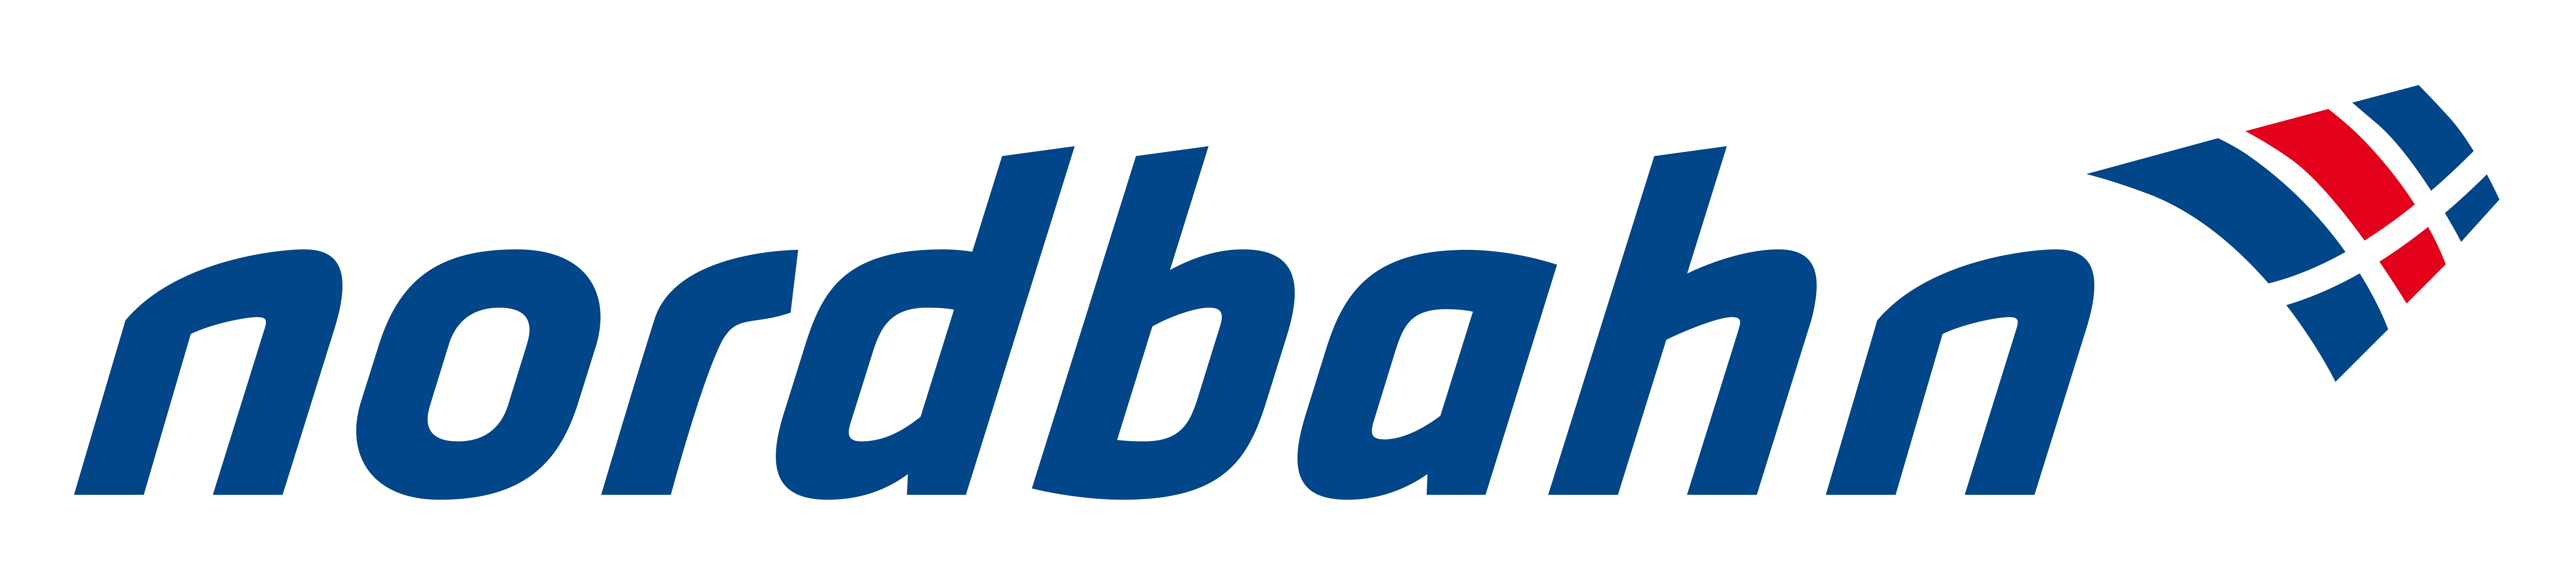 NBE nordbahn